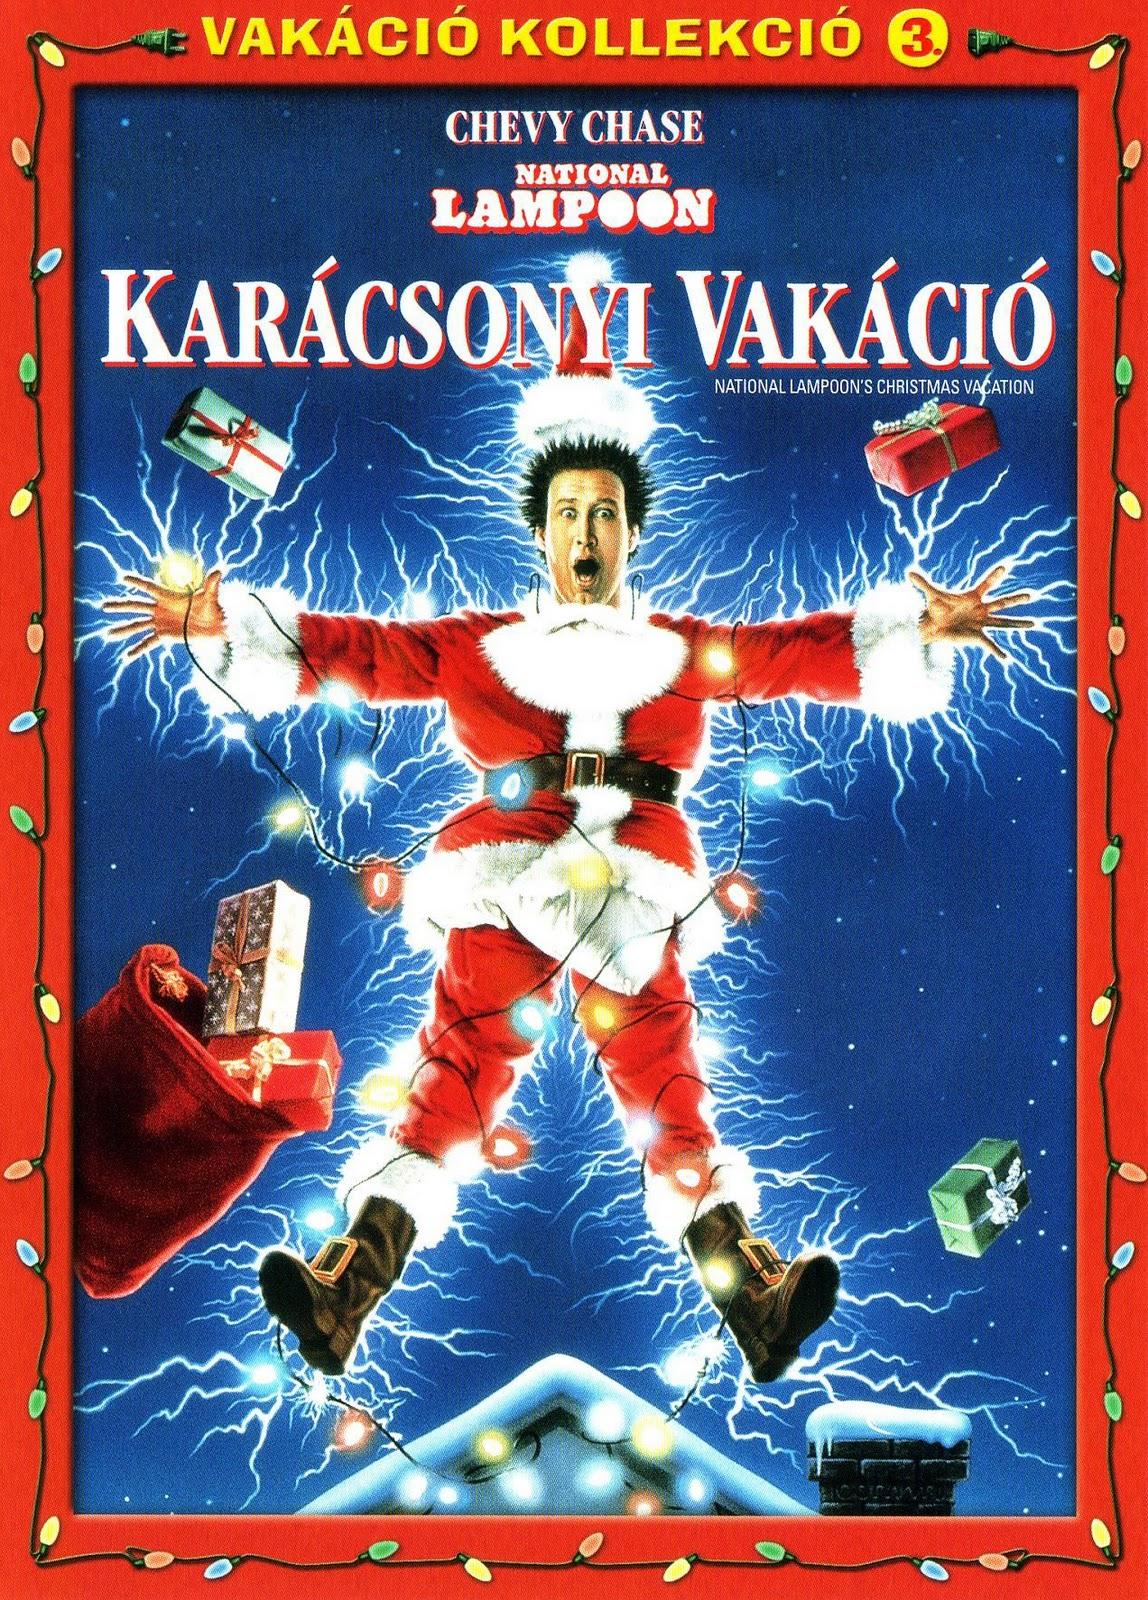 Christmas Vacation Dvdrip: Karácsonyi Vakáció (Christmas Vacation)